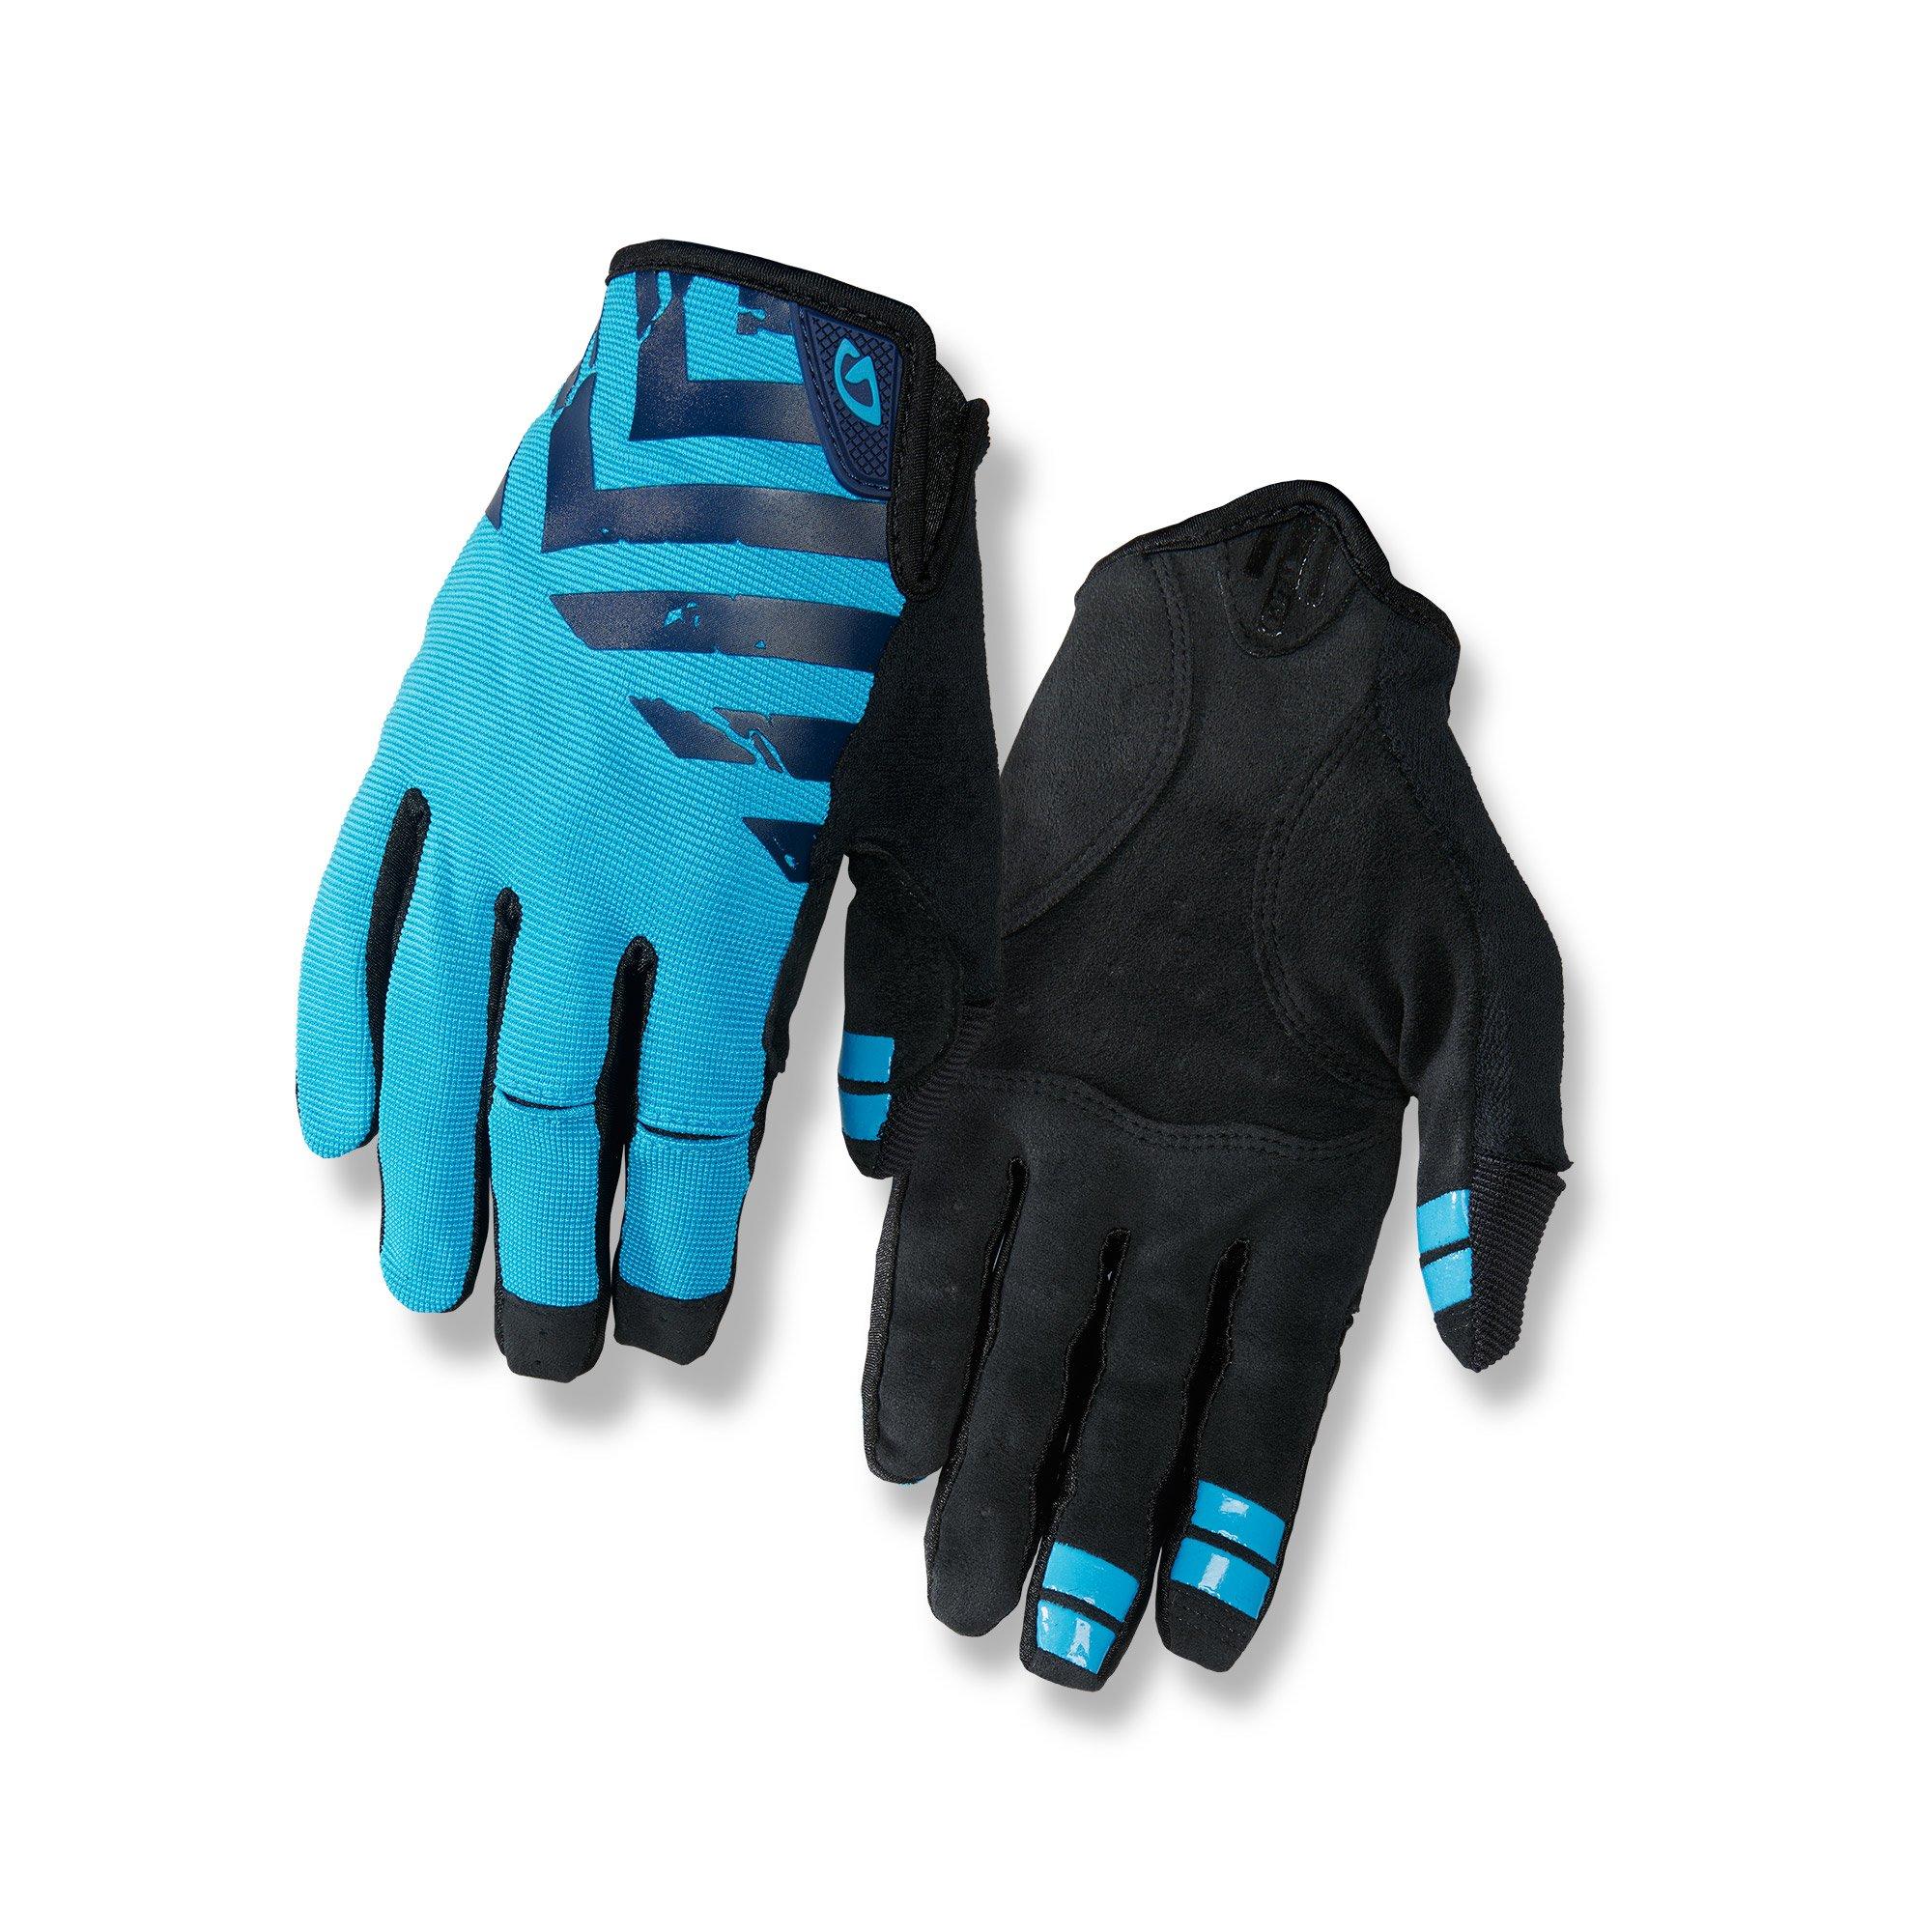 Giro DND Mountain Bike Gloves Midnight/Blue Jewel/Black XL by Giro